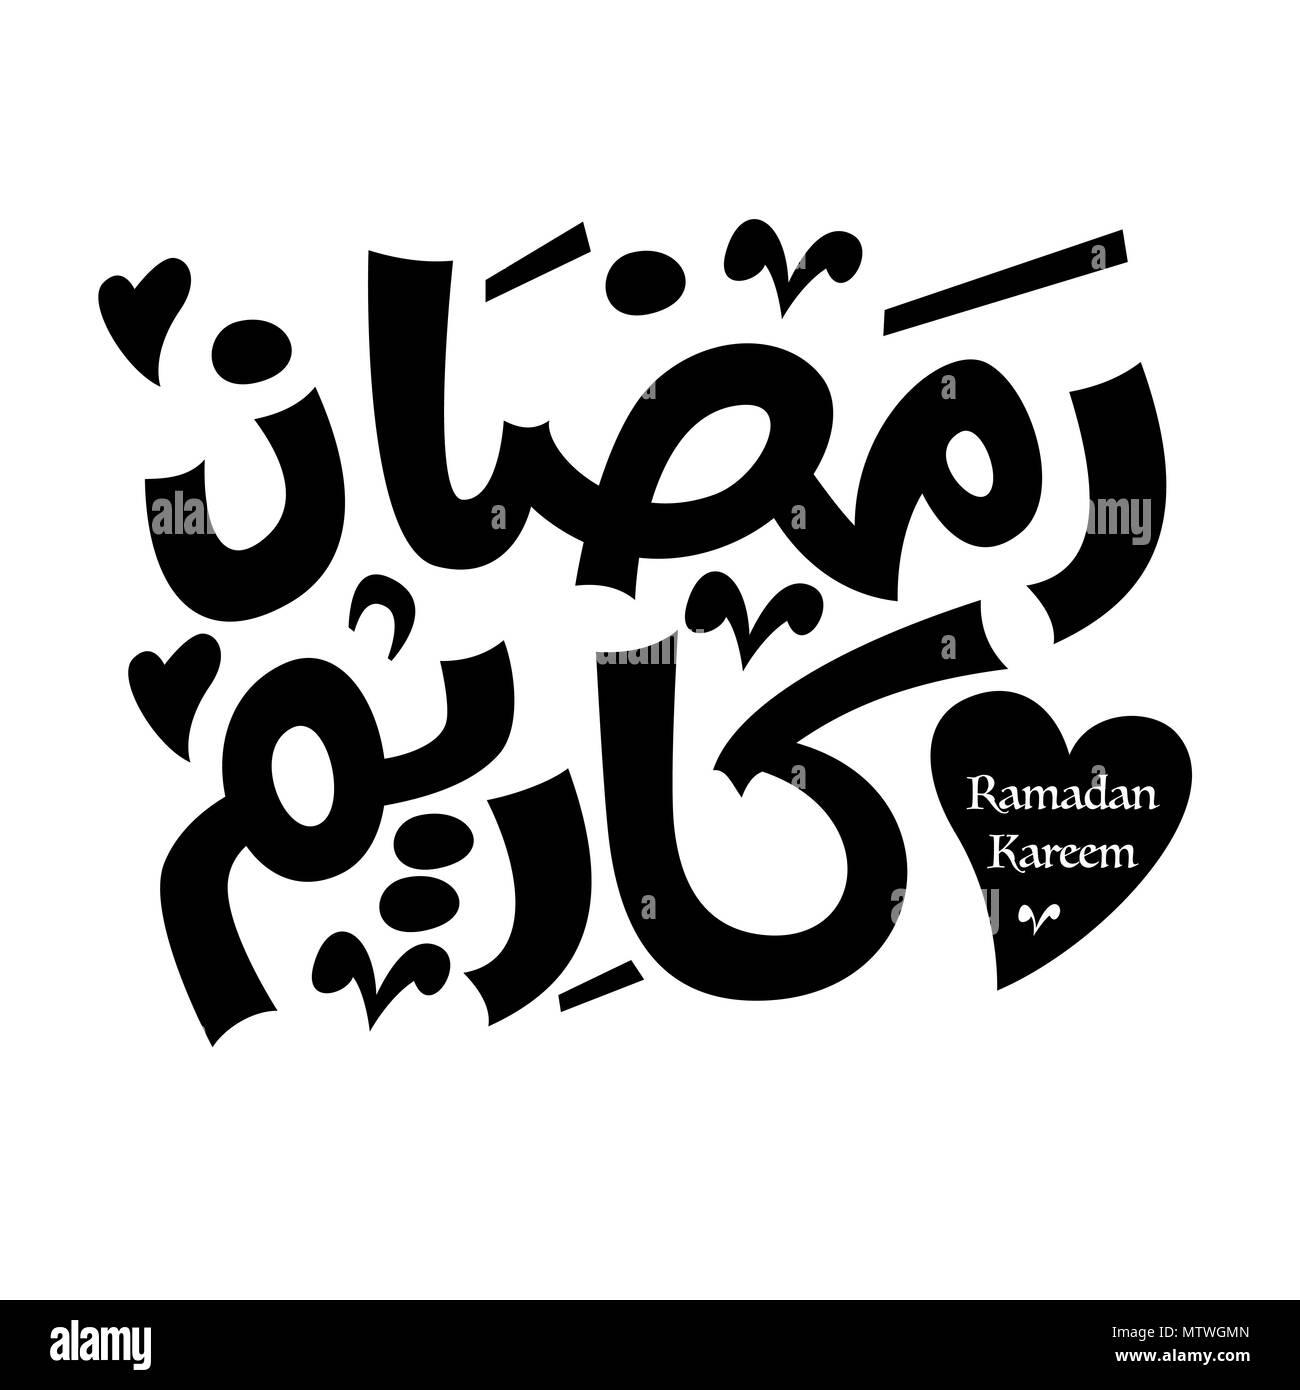 Ramadan Kareem Arabic Calligraphy Ramadan Typography On White Background Stock Vector Image Art Alamy